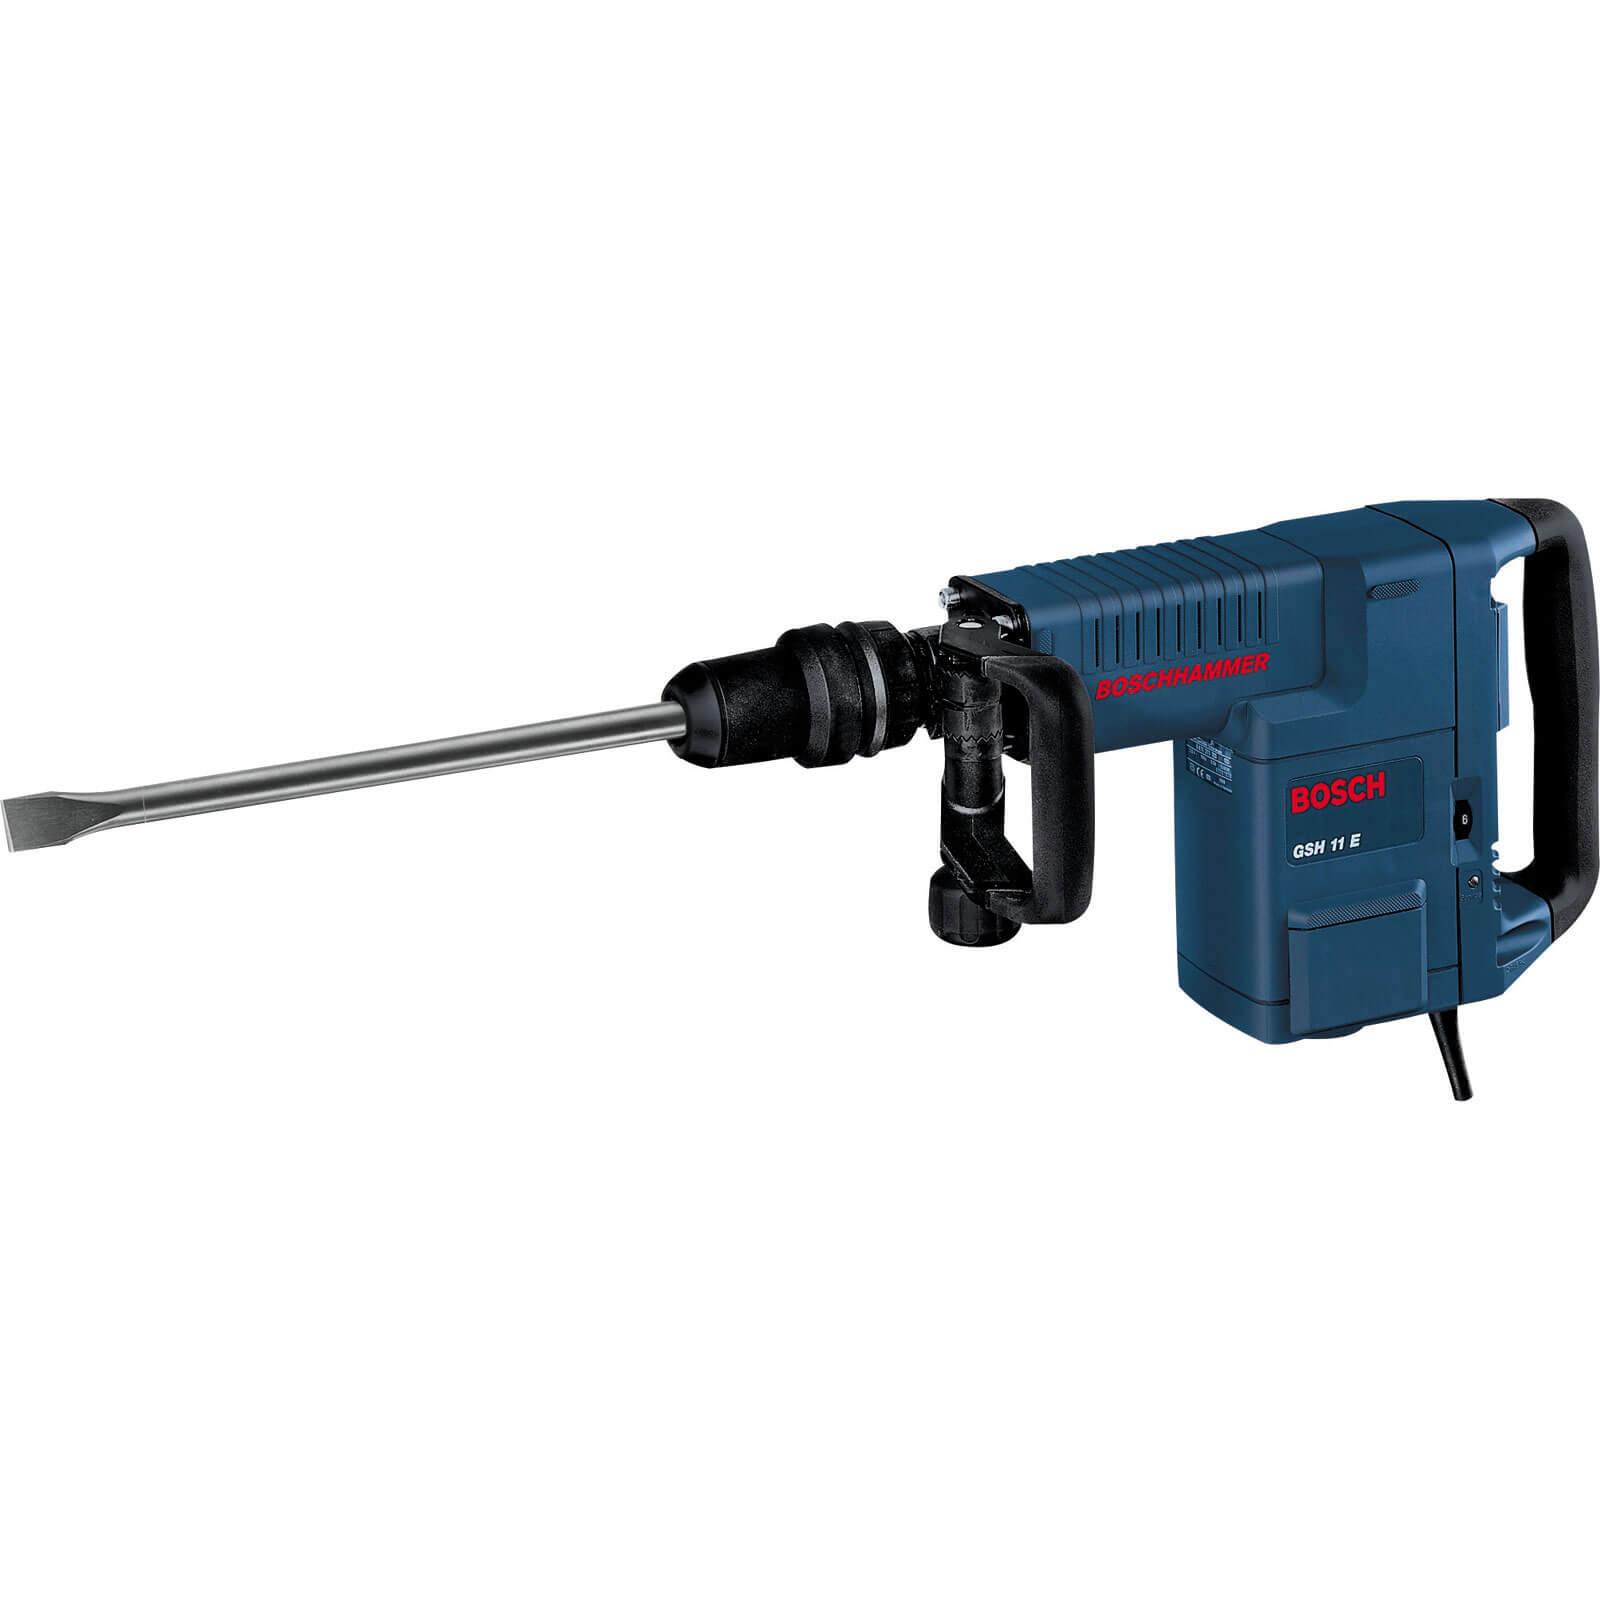 Image of Bosch GSH 11E SDS Max Demolition Hammer 240v